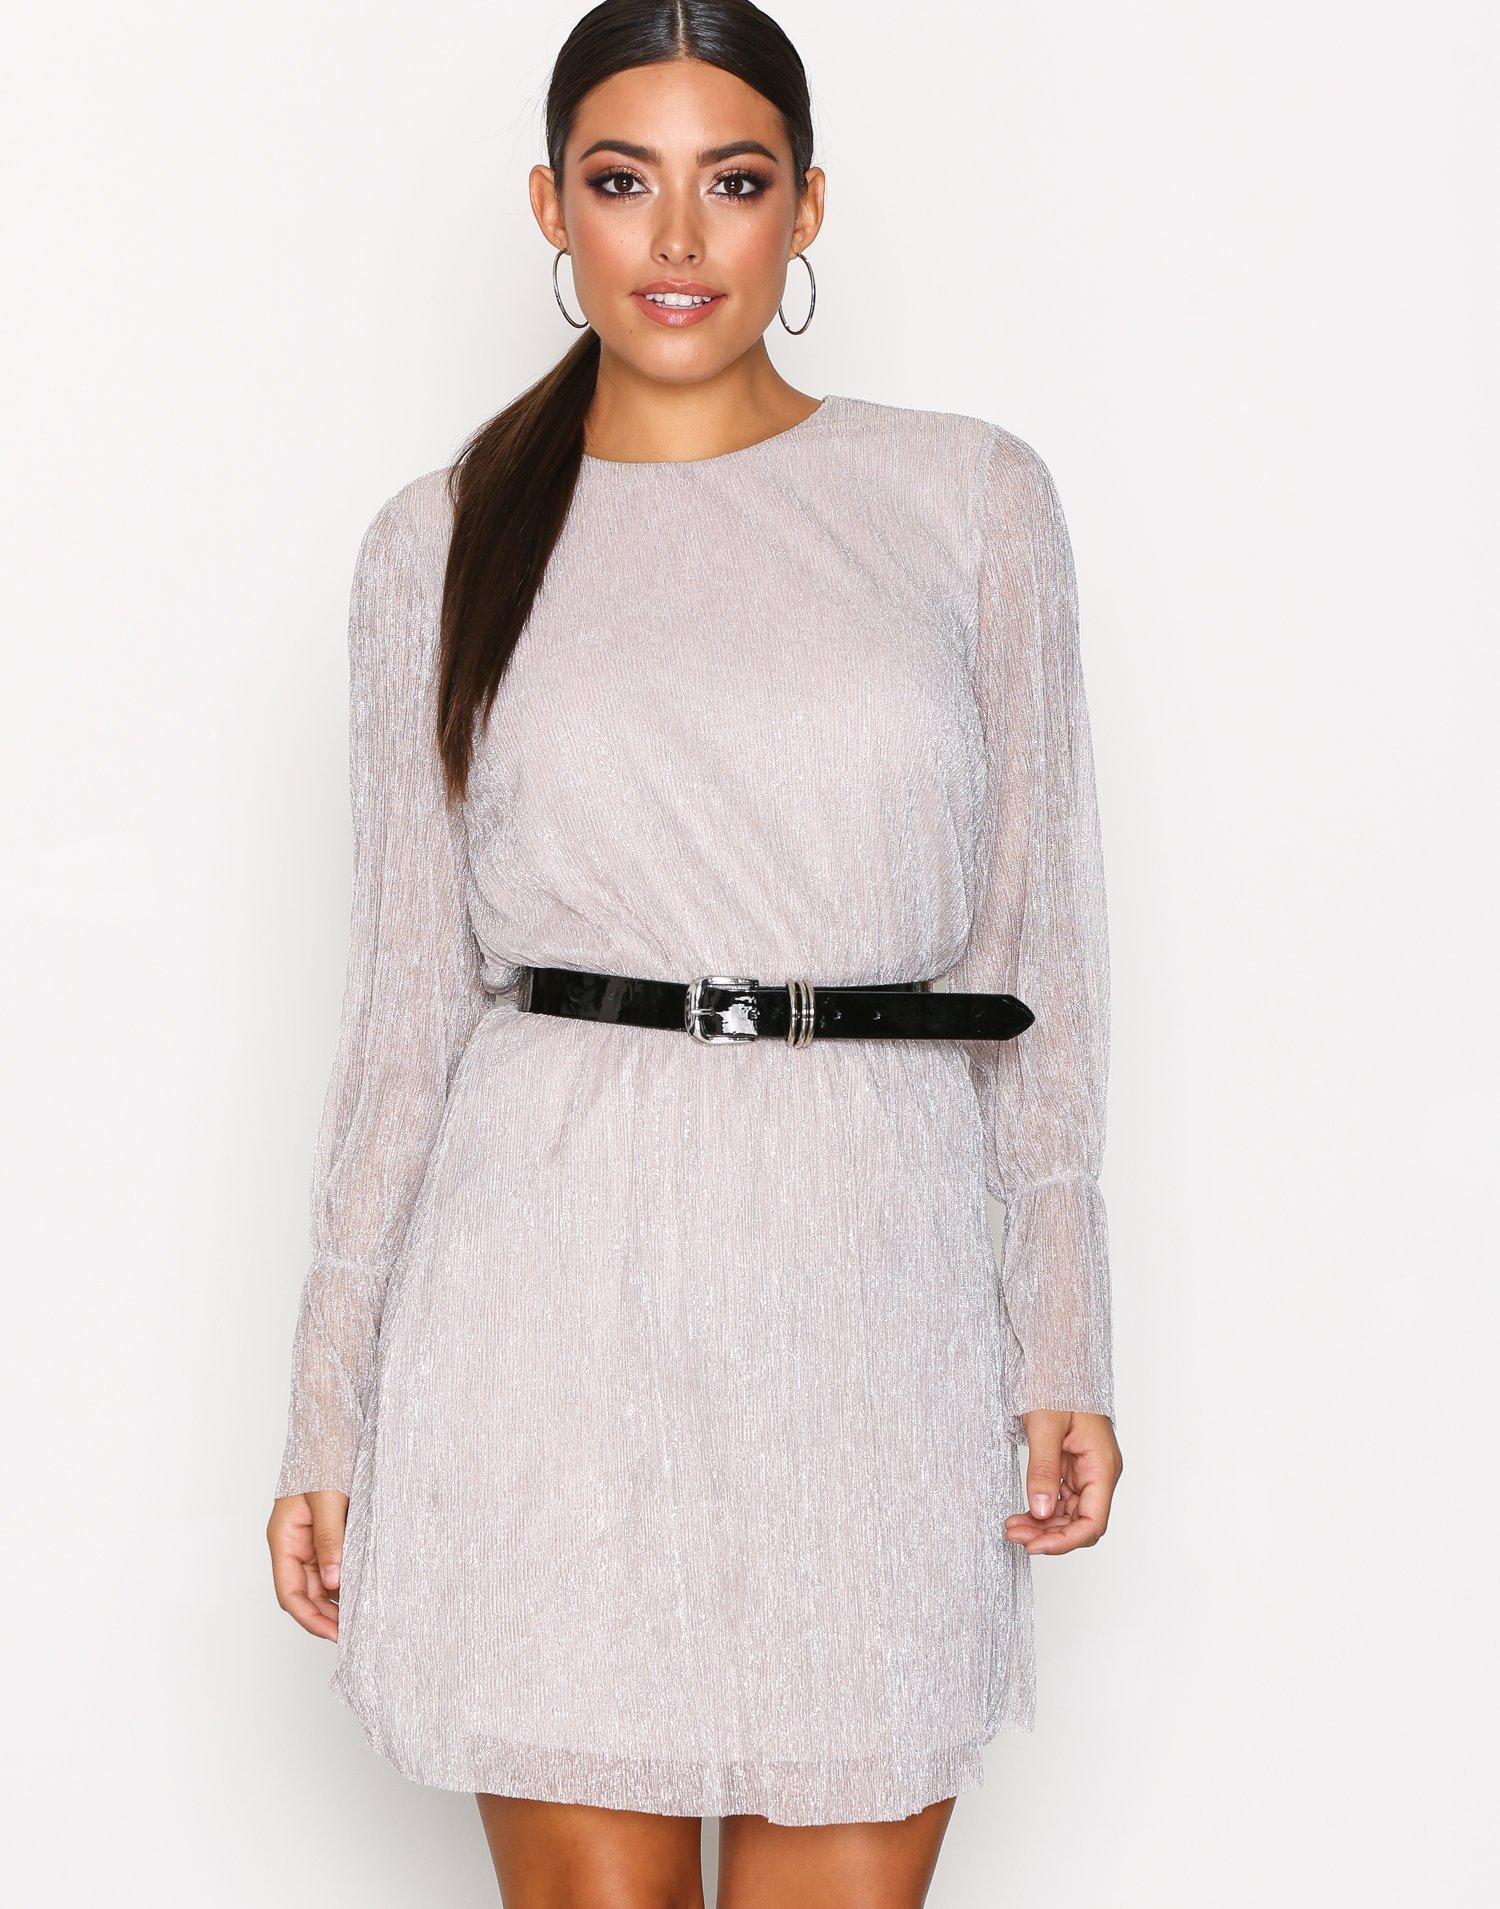 Onl Yade Circular L/S Dress Wvn by Only